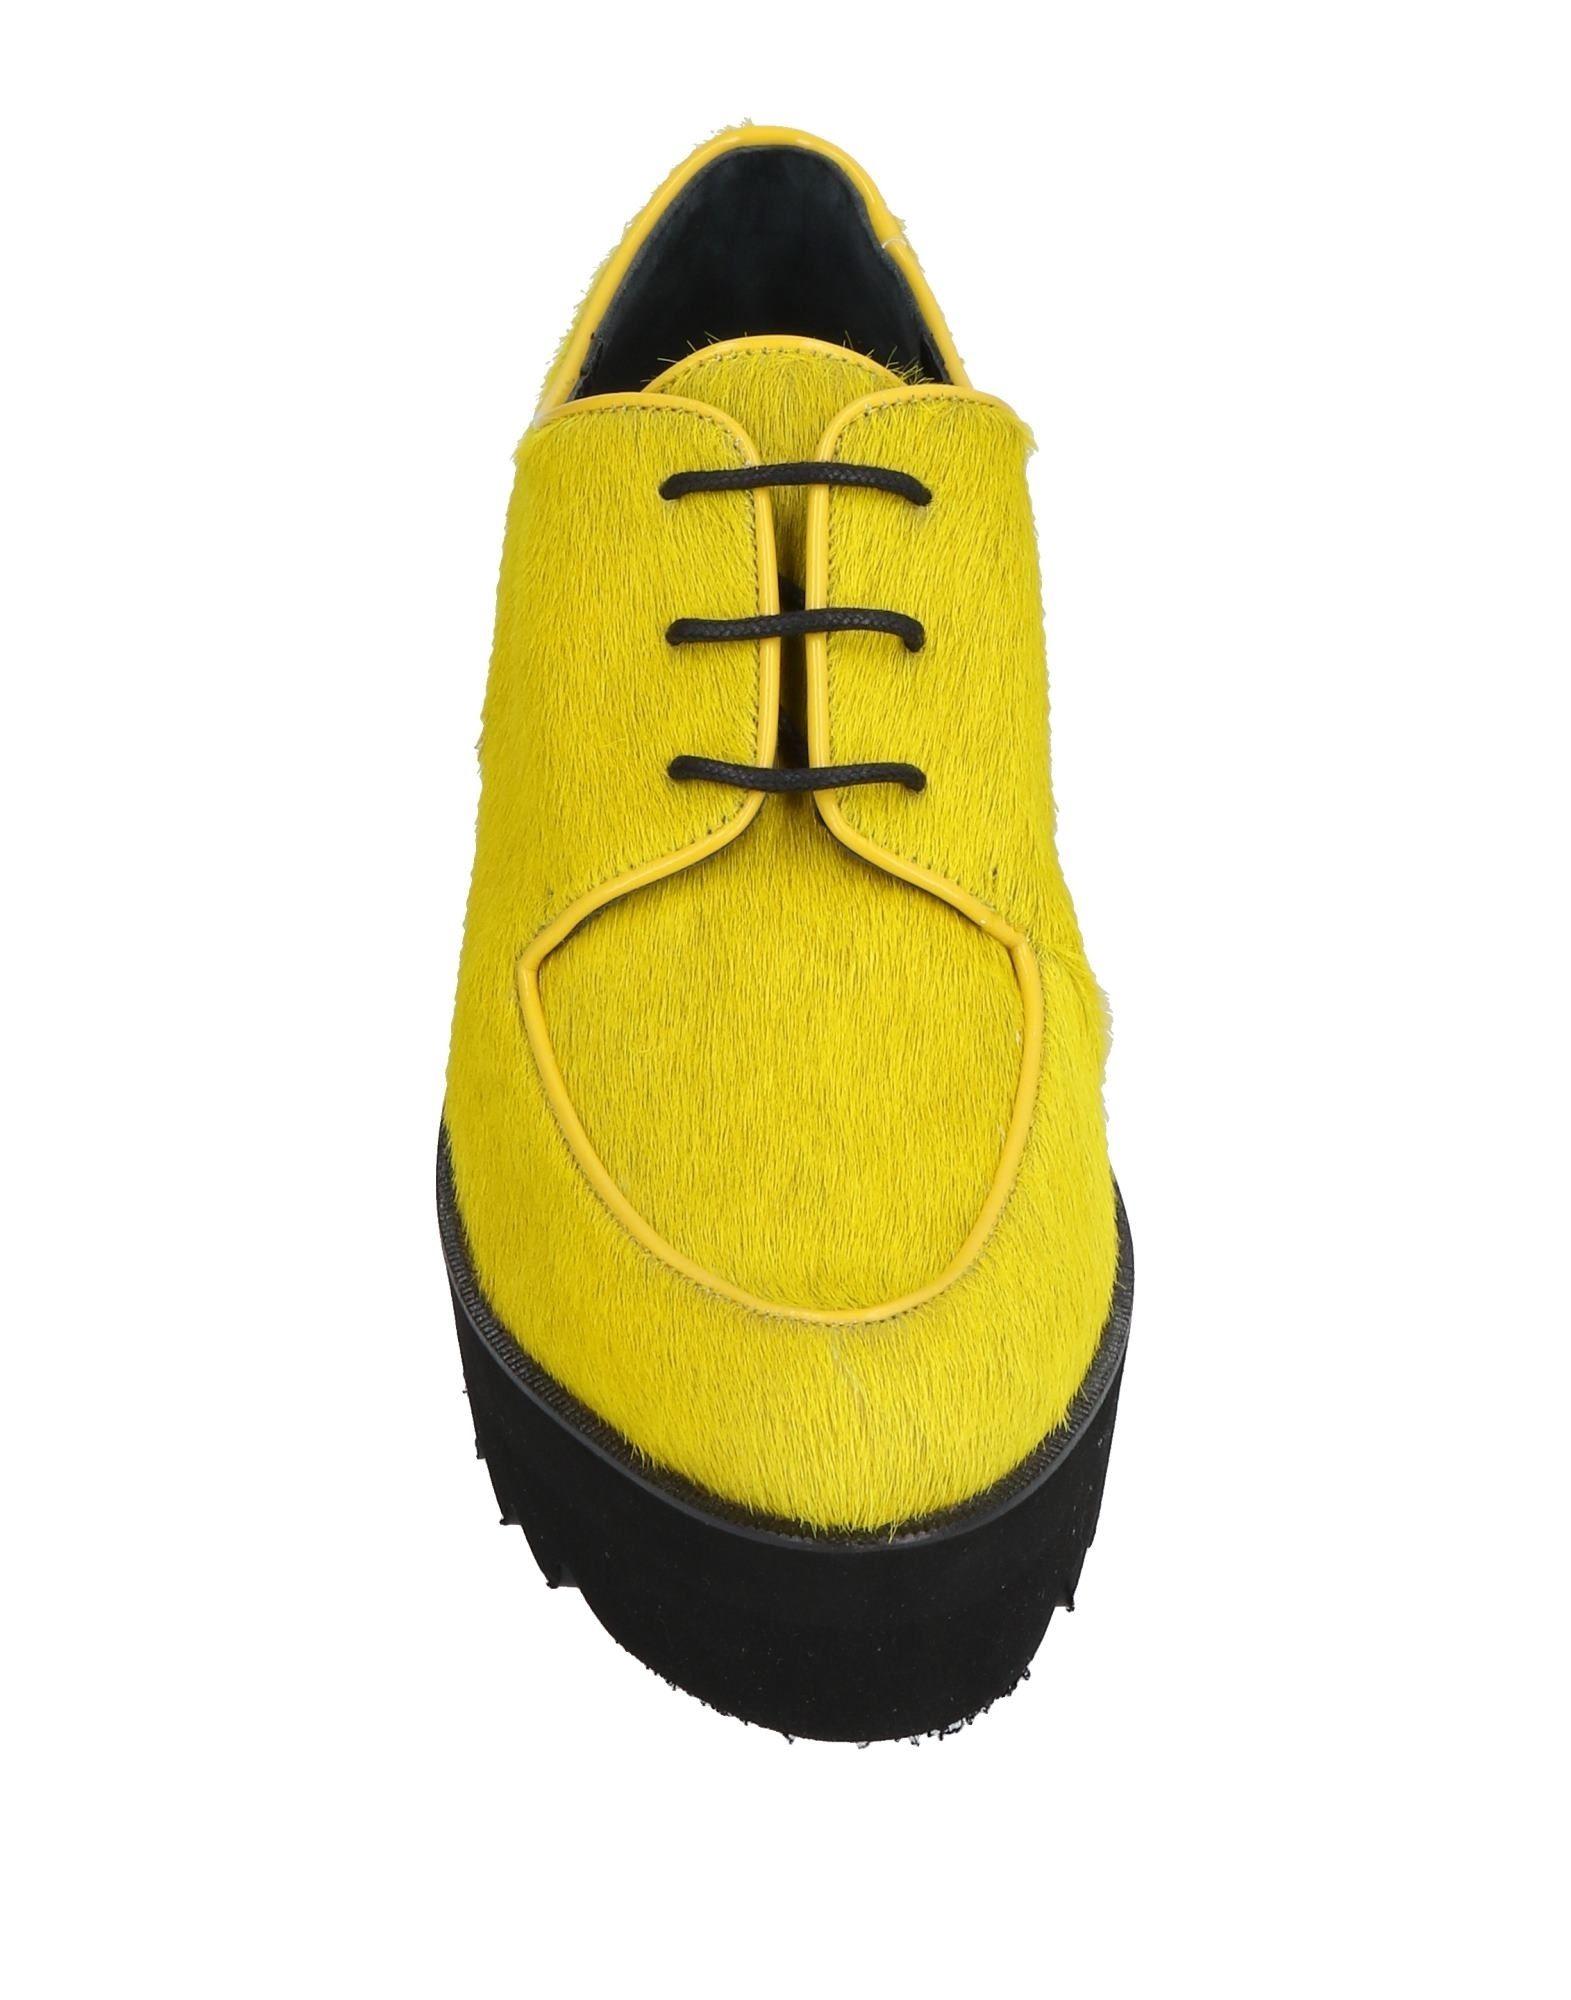 Stilvolle billige Schuhe Paloma 11501154PW Barceló Schnürschuhe Damen  11501154PW Paloma e10cba